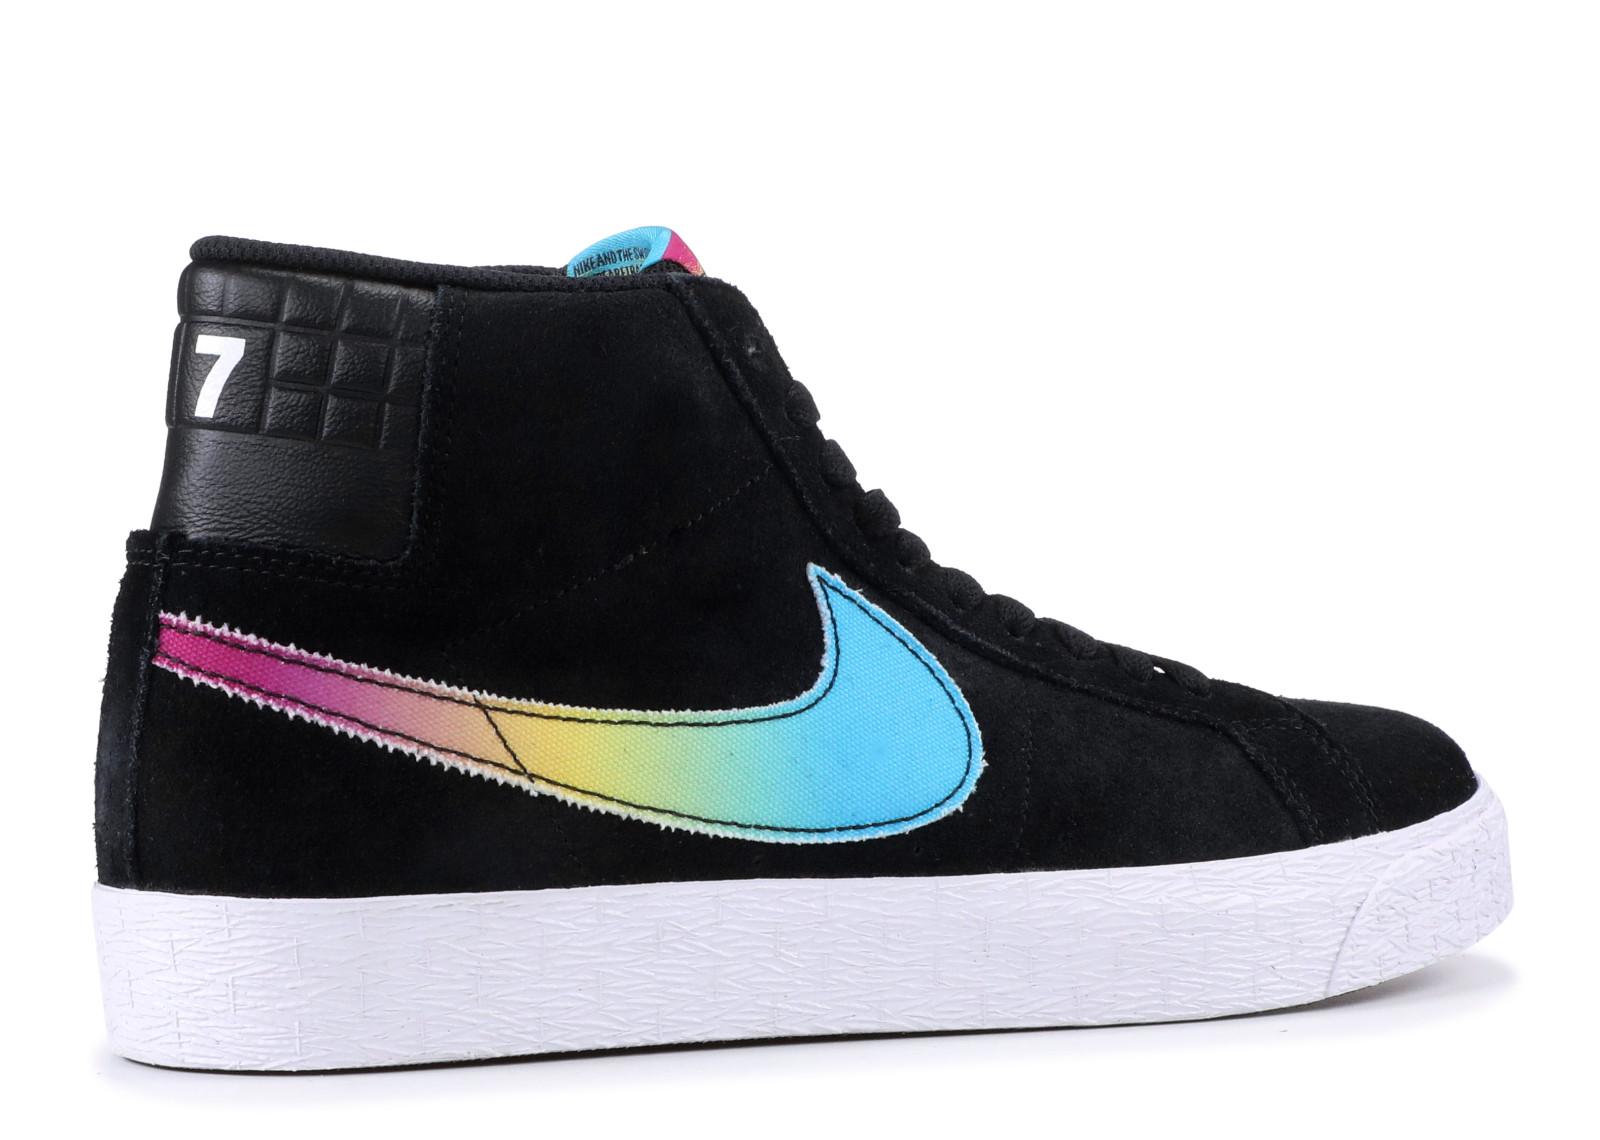 buy popular 45963 d3edc Nike SB Blazer Zoom Mid Lance Mountain 70s Black - 1